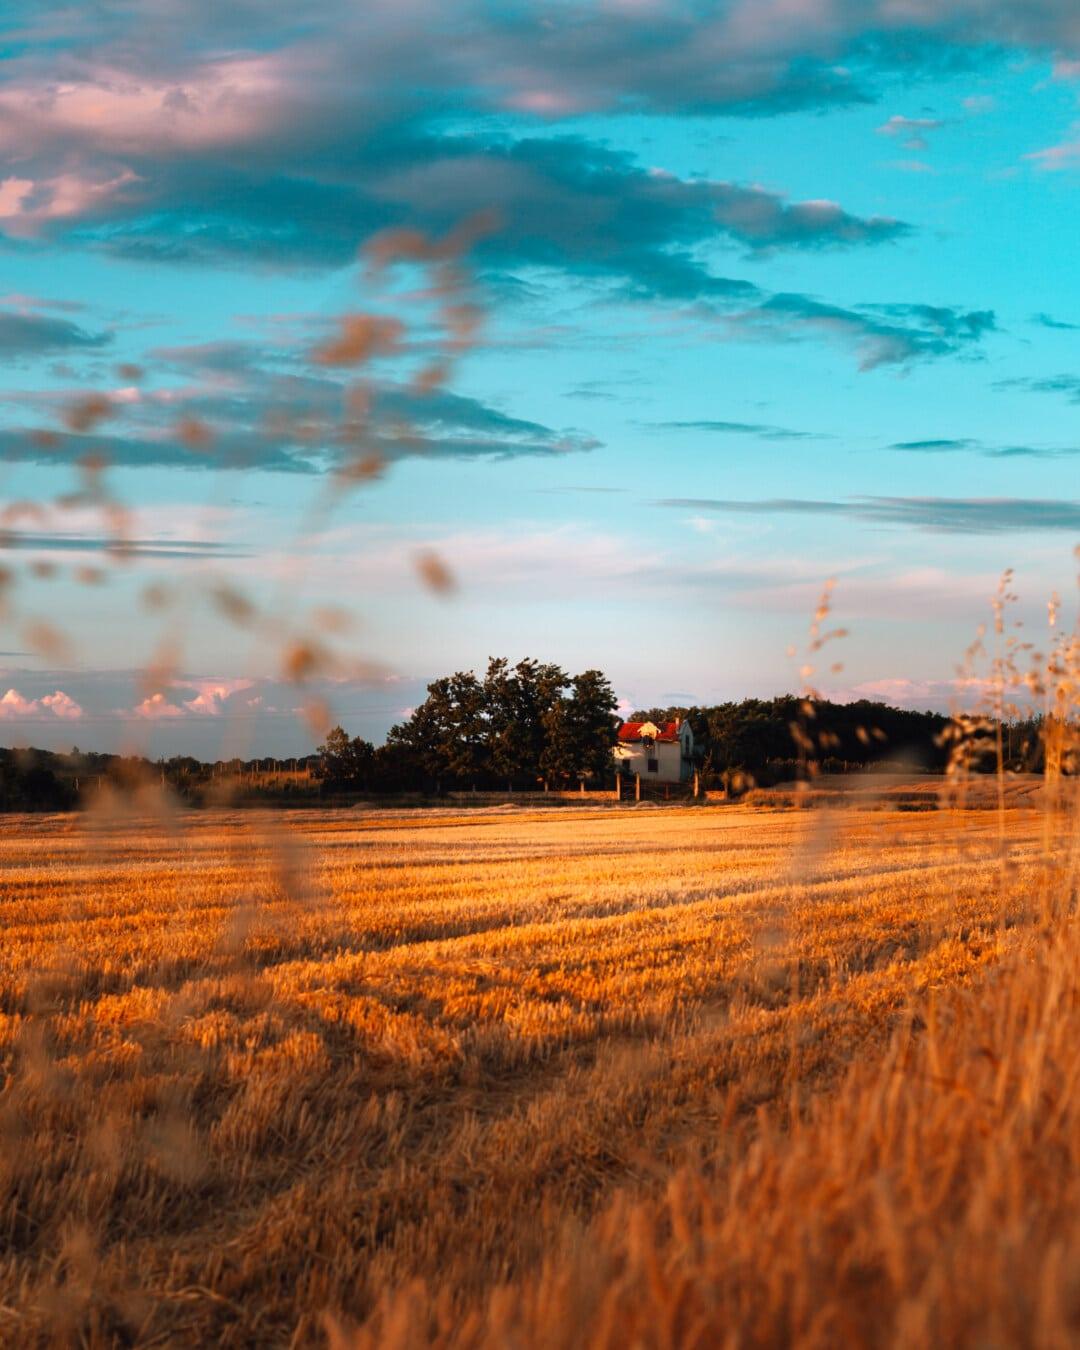 Landwirtschaft, Weizenfeld, Landschaft, Sonnenuntergang, Sonne, Sonnenaufgang, Wolken, Atmosphäre, Wolke, Sommer